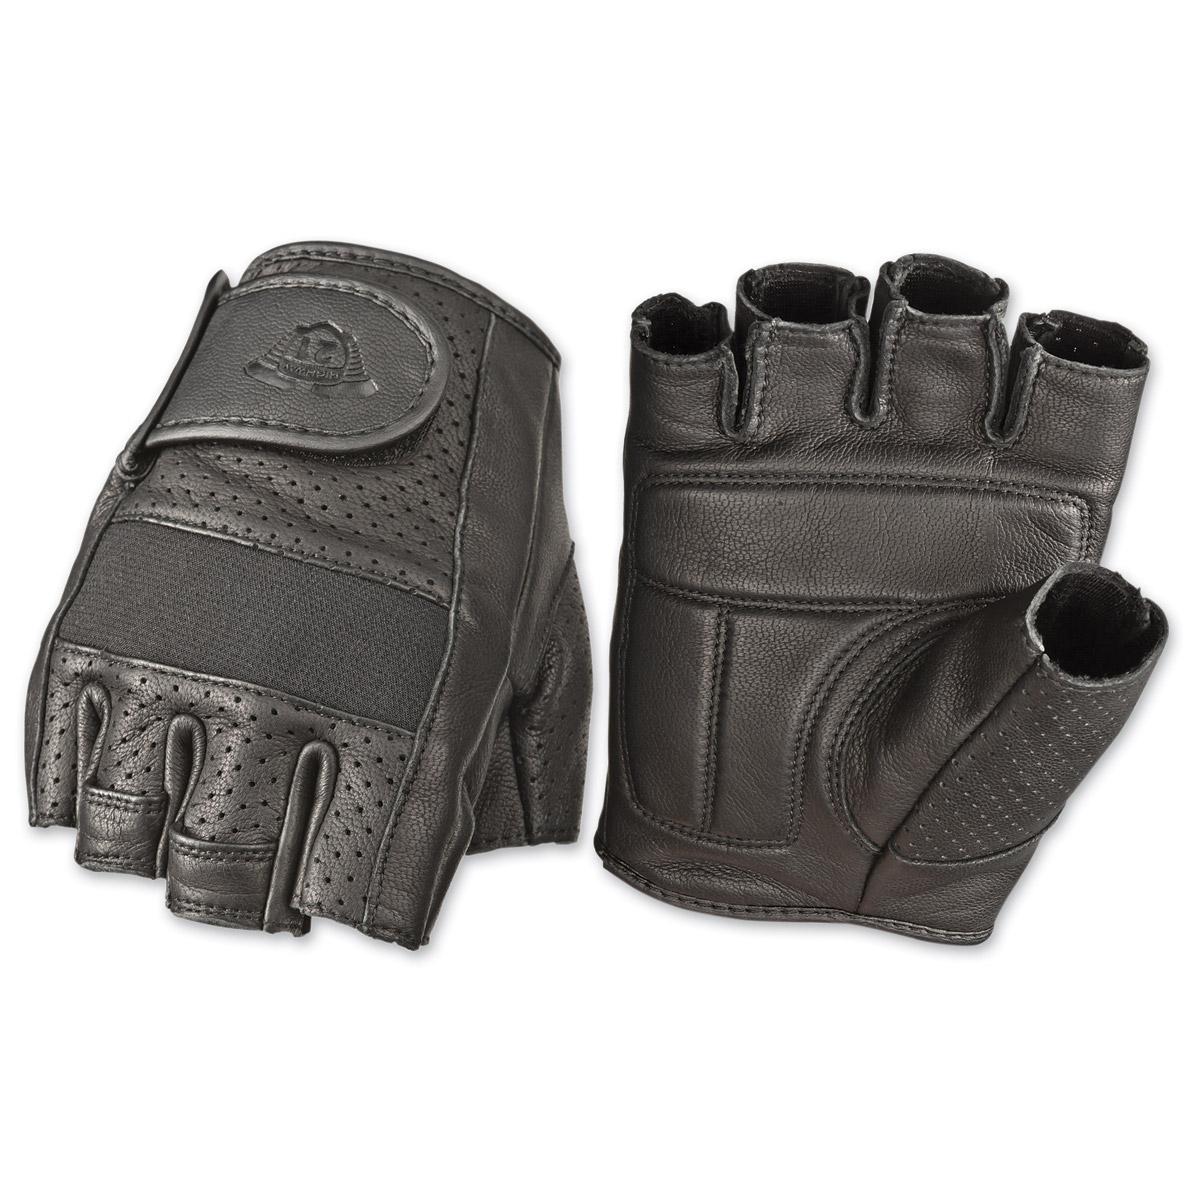 Highway 21 Men's Jab Perforated Fingerless Black Leather Gloves